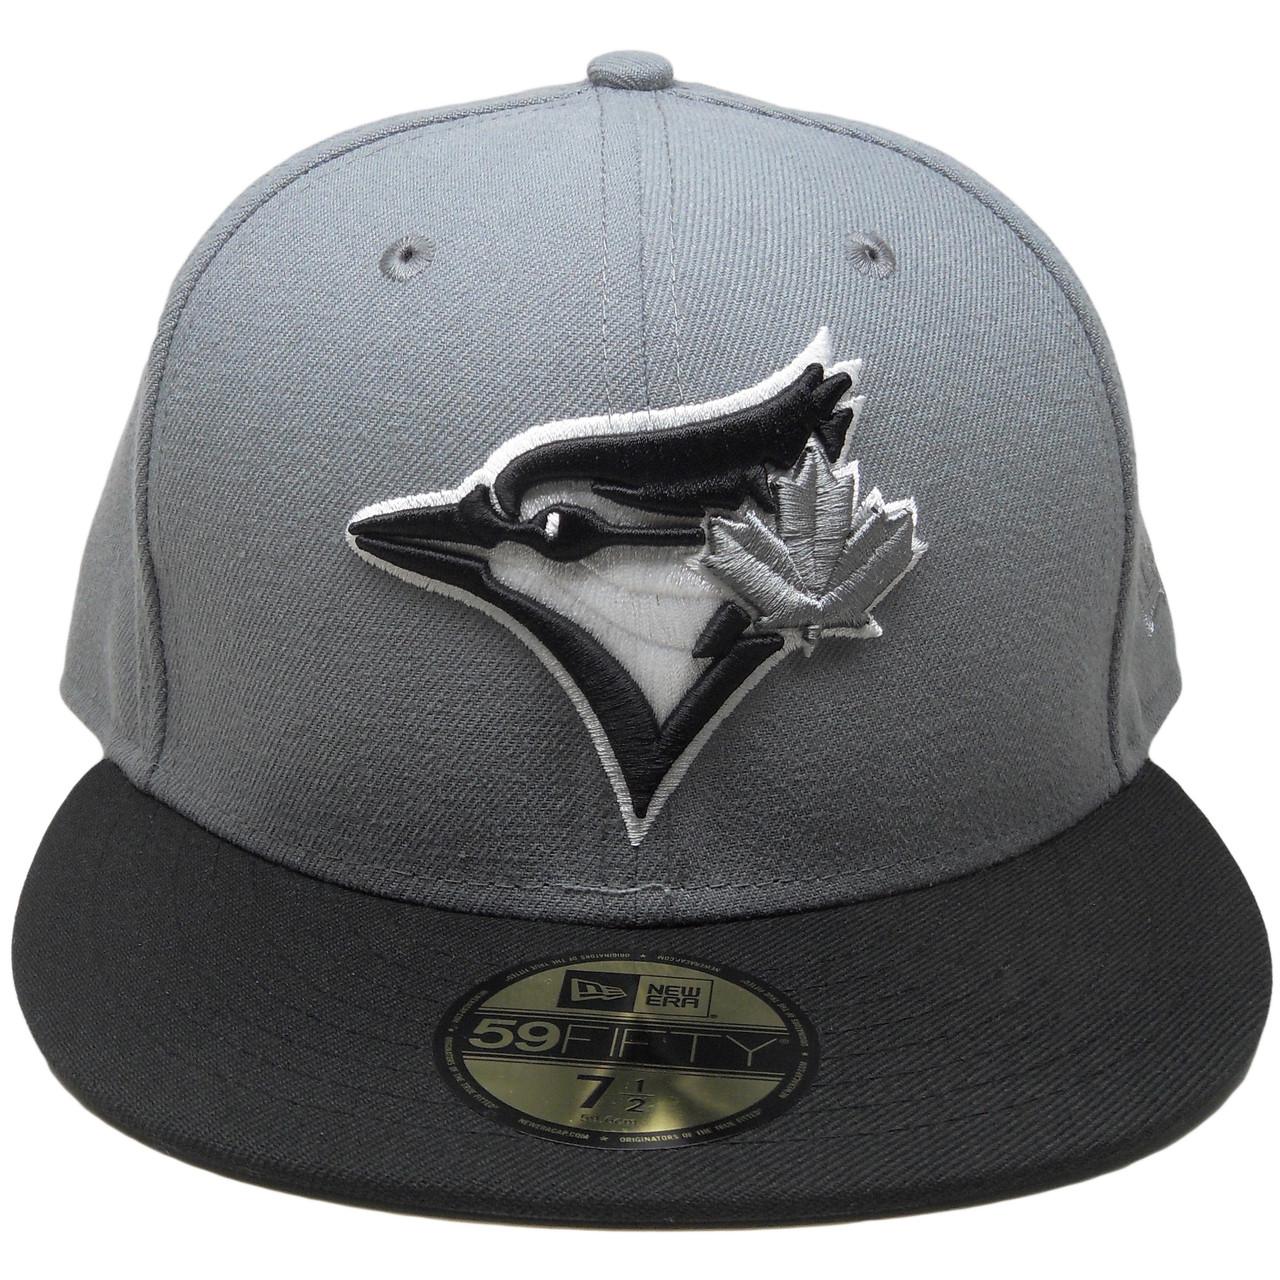 cafed5e9f8b Toronto Blue Jays New Era Custom 59Fifty Fitted Hat - Storm Gray ...